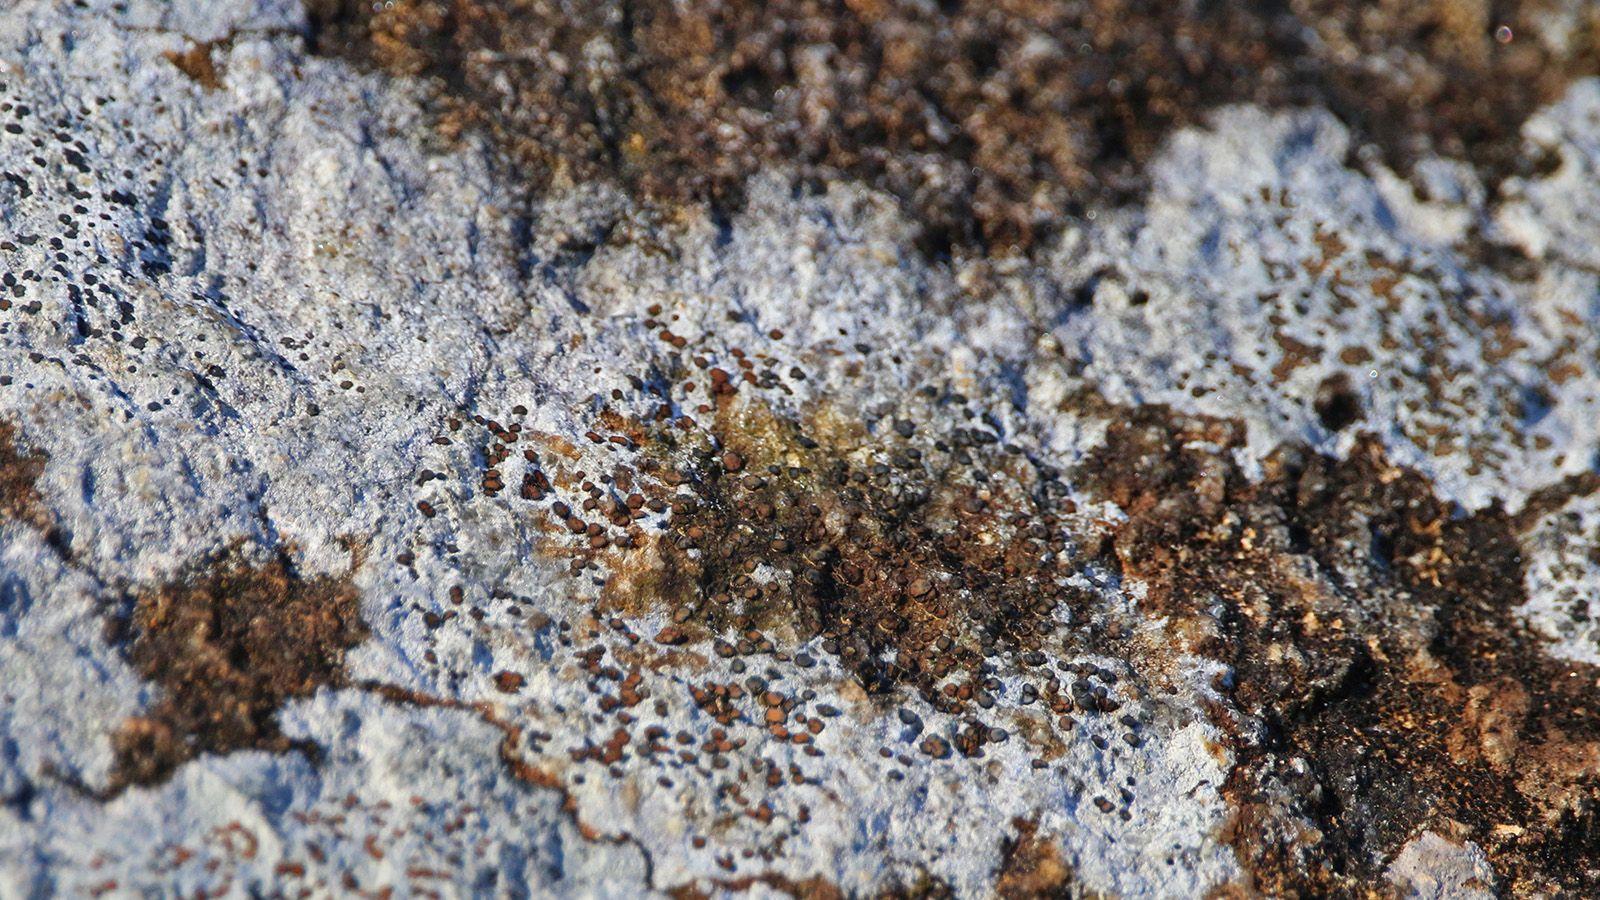 Lichen growing on bark banner image